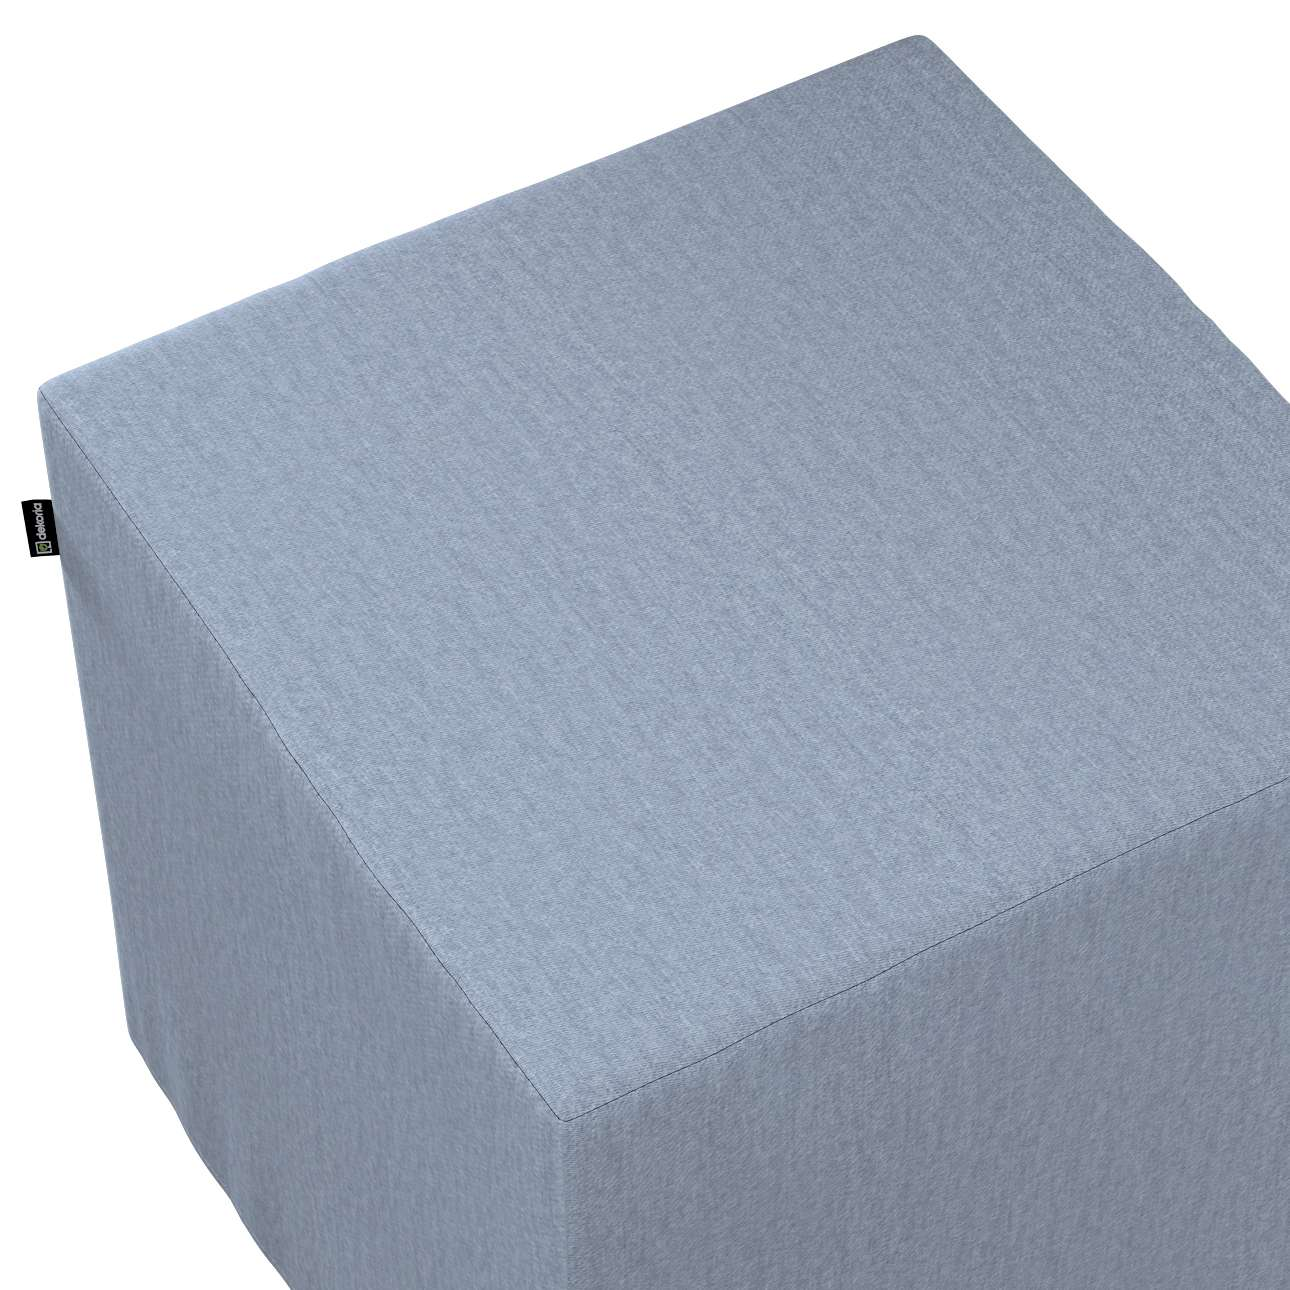 Pufa kostka w kolekcji Chenille, tkanina: 702-13